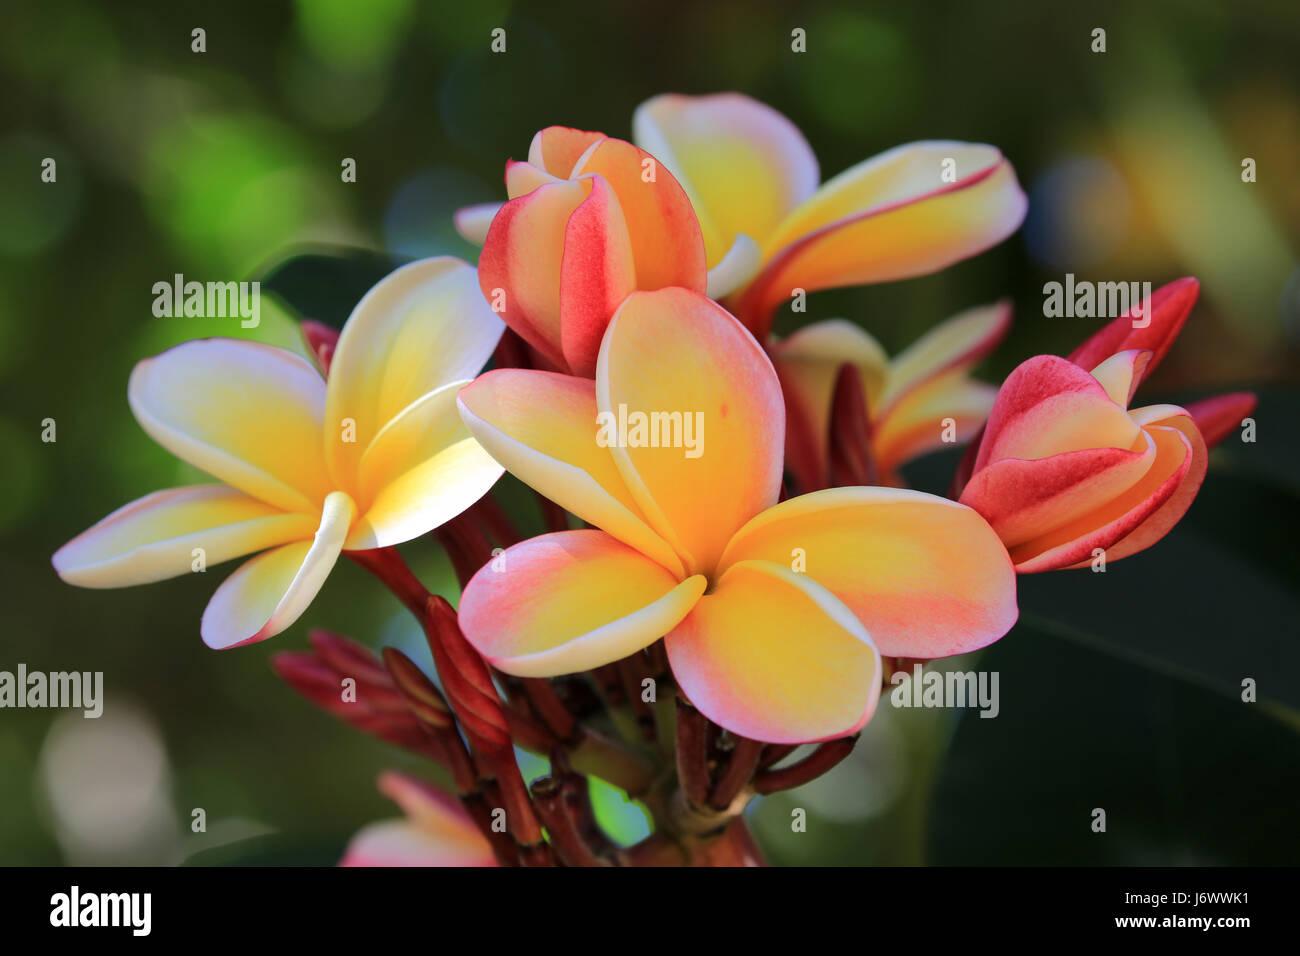 Floral lei hawaii stock photos floral lei hawaii stock images alamy lei rainbow plumeria flowers hawaii stock image izmirmasajfo